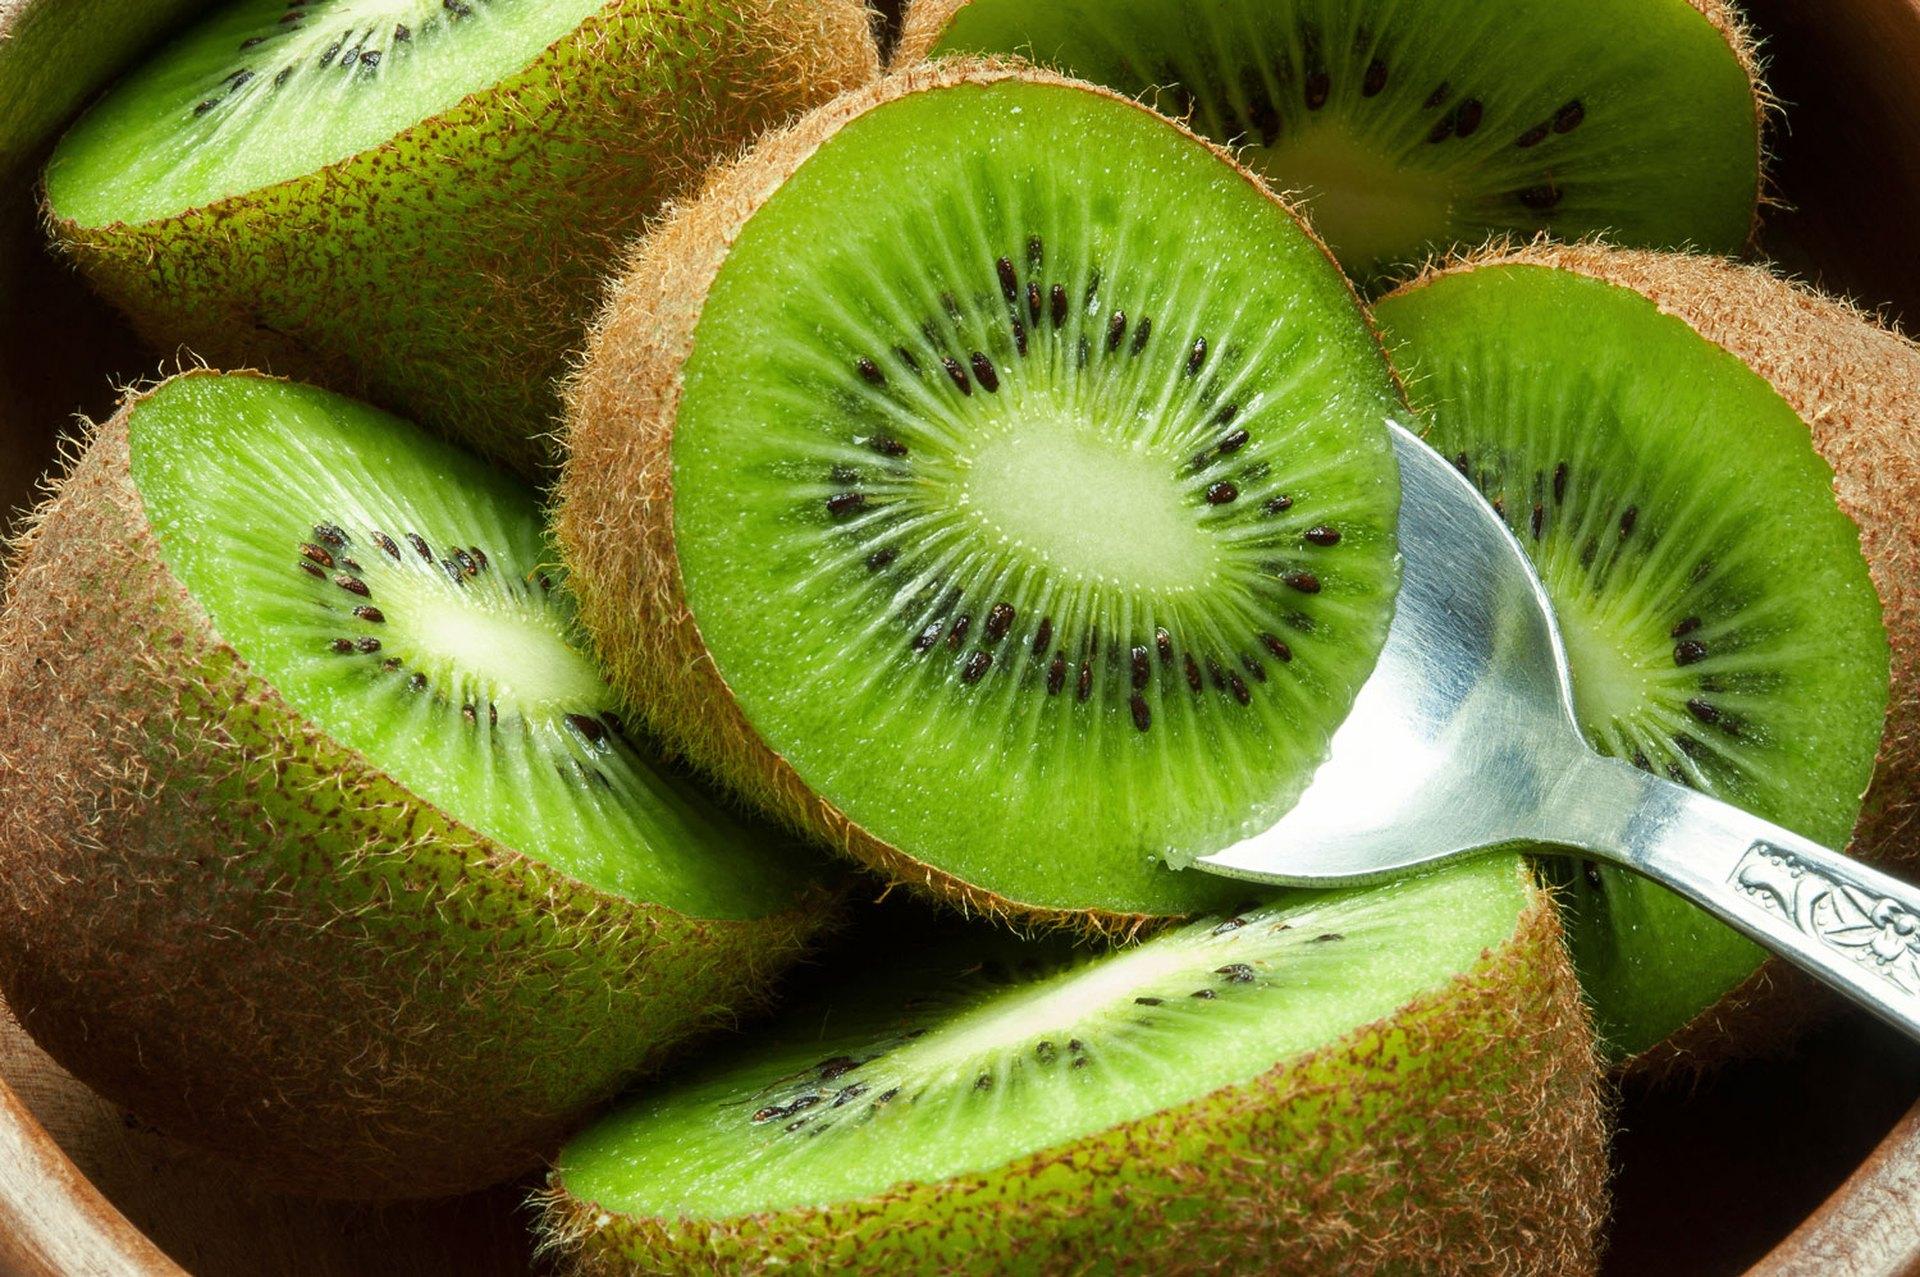 Watch 3 Ways to Eat a Kiwi video